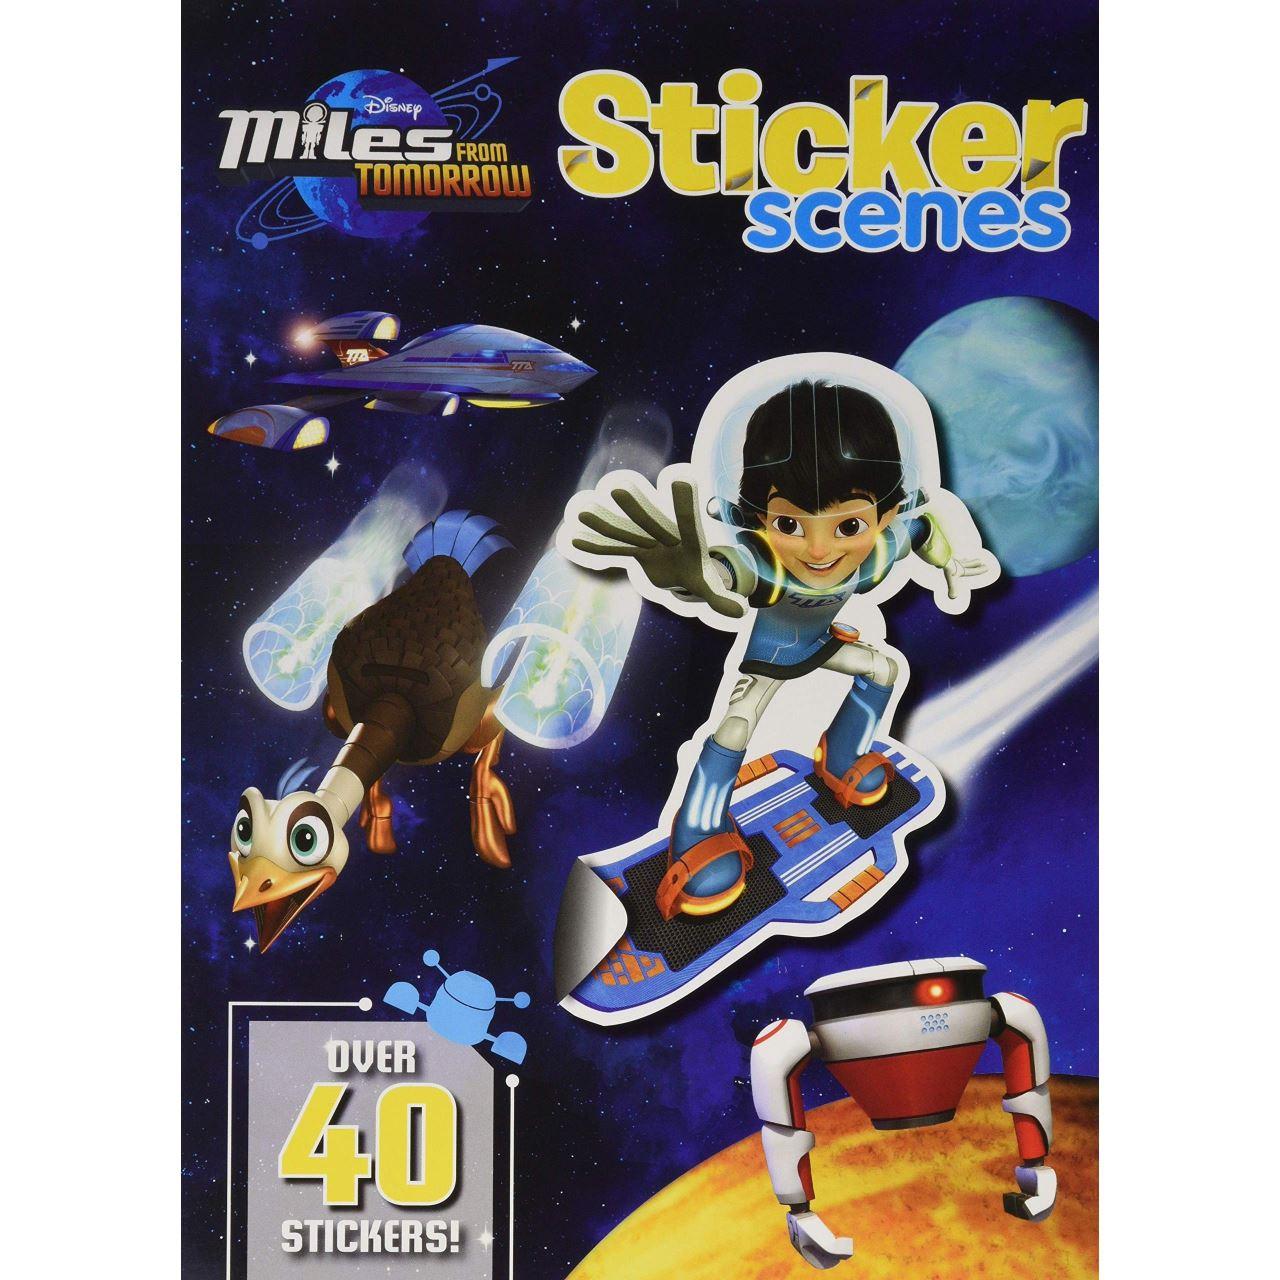 Disney Junior Miles From Tomorrow Sticker Scenes imagine